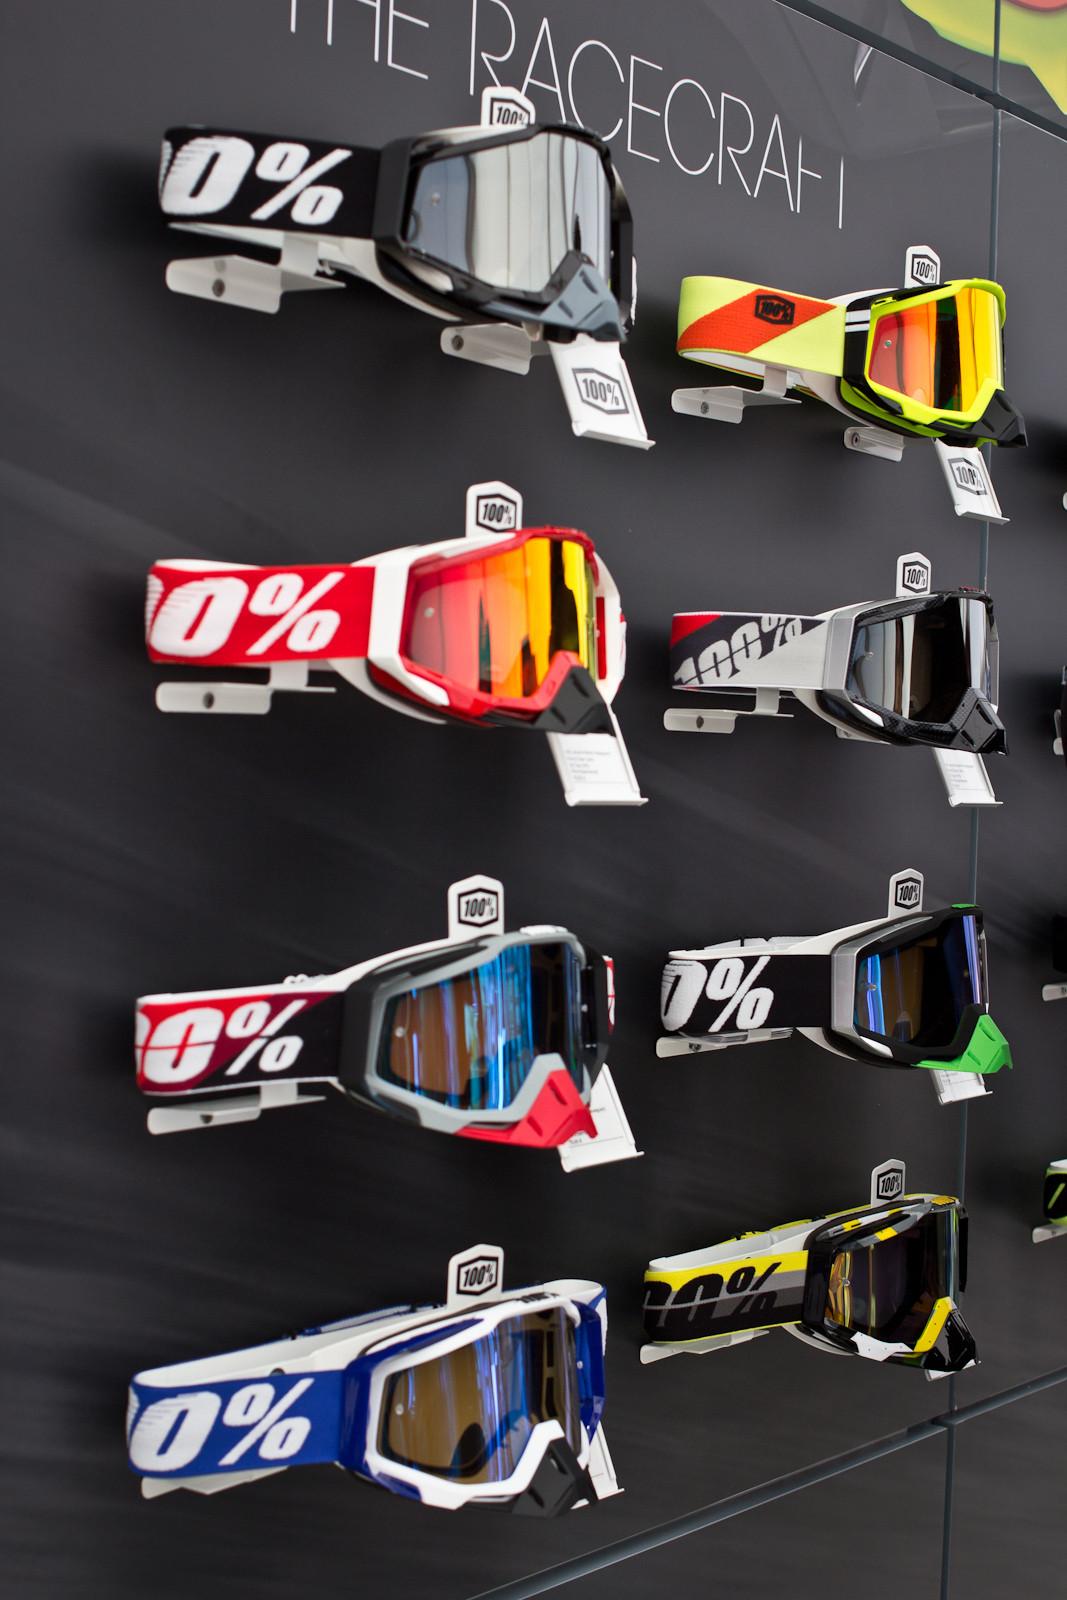 2014 100% Racecraft Goggles - 2014 Mountain Bike Apparel & Protection at Eurobike 2013 - Mountain Biking Pictures - Vital MTB